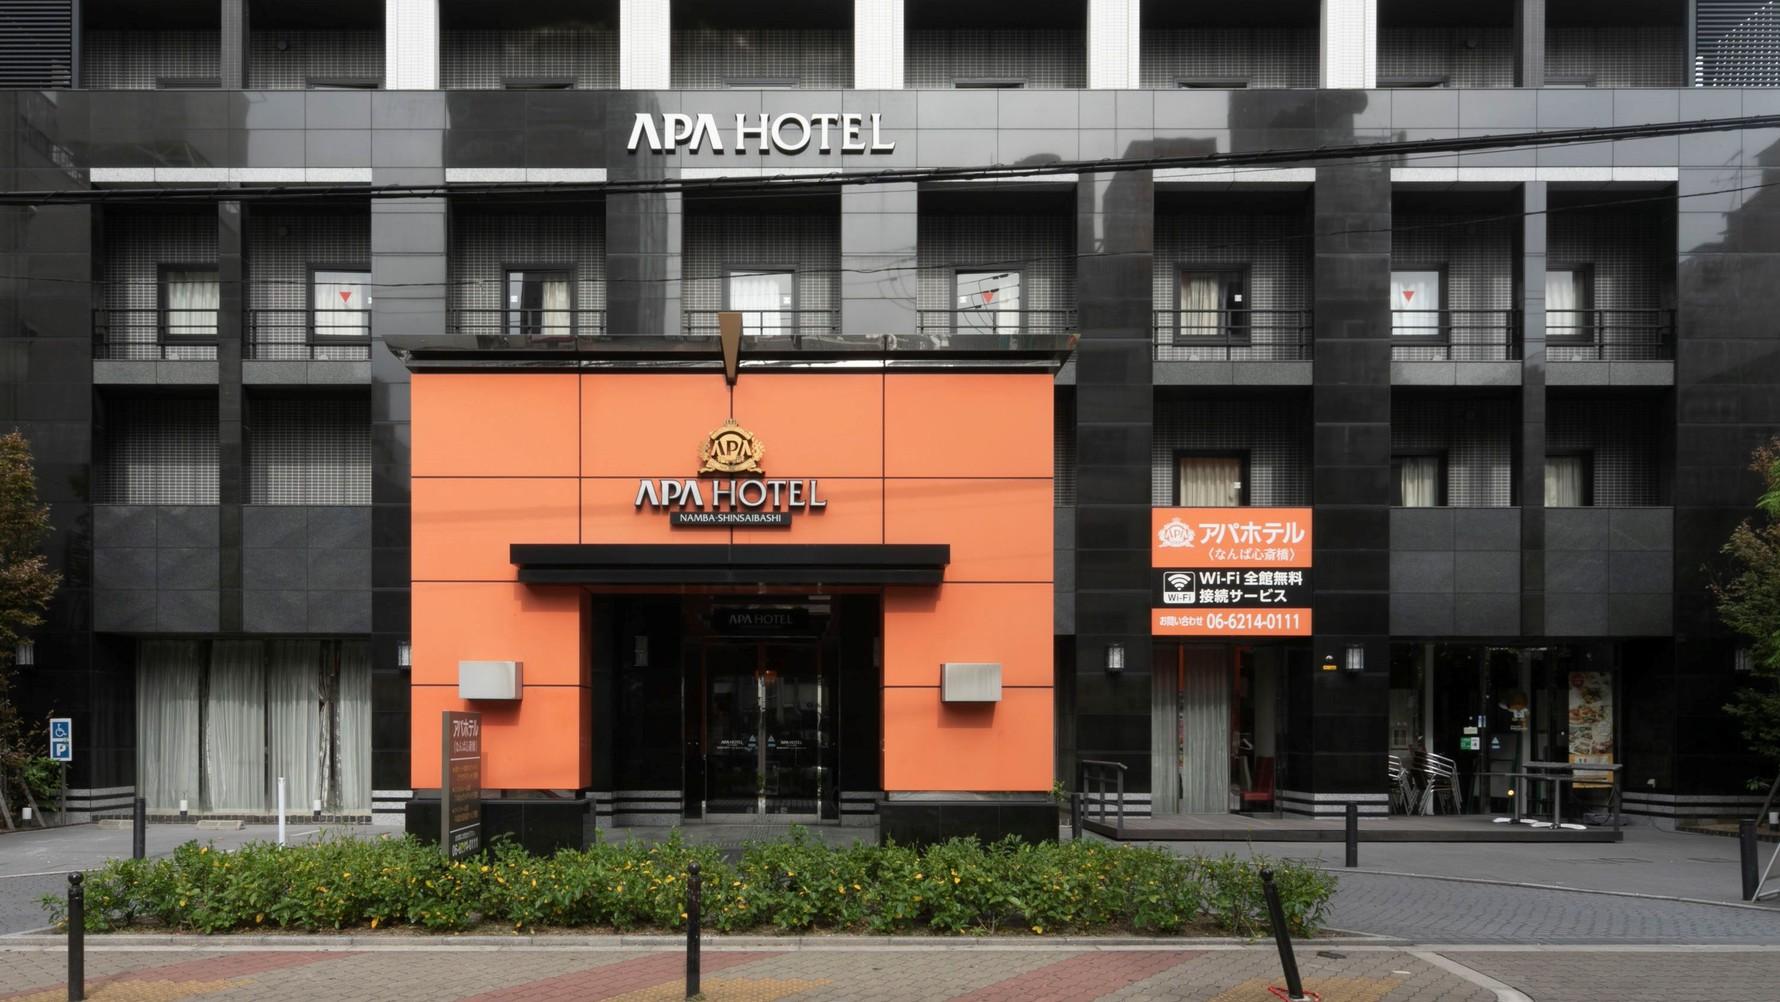 APA Hotel (Namba Shinsaibashi)